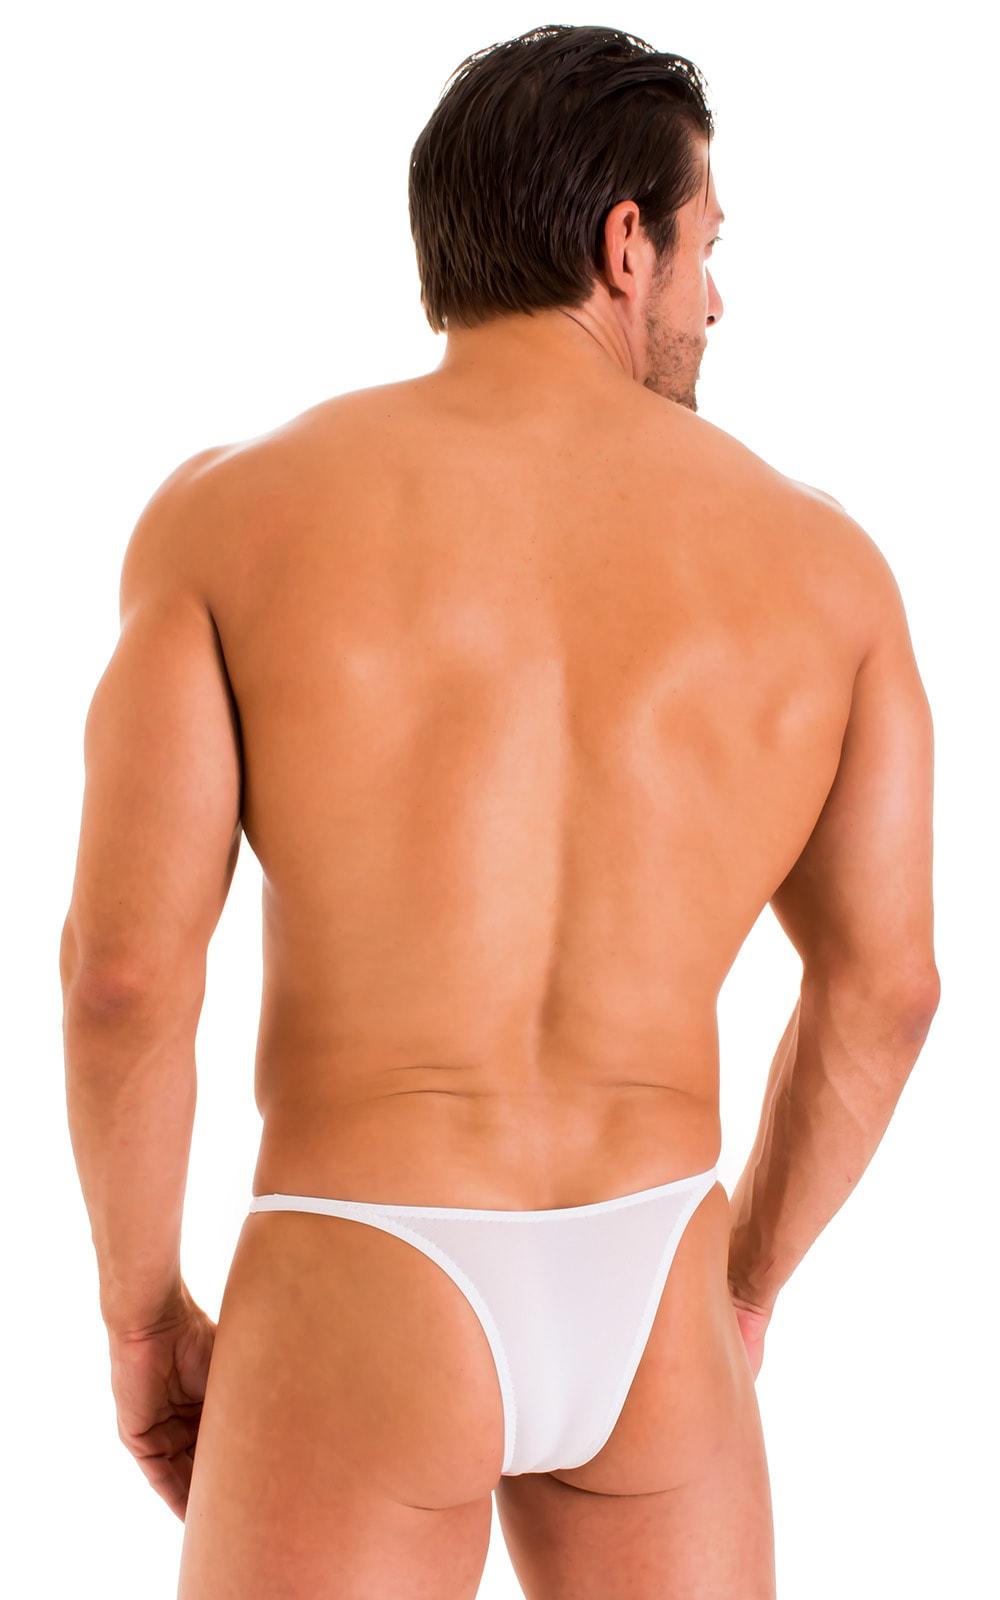 Sunseeker Micro Pouch Half Back Bikini in Super ThinSKINZ White 3